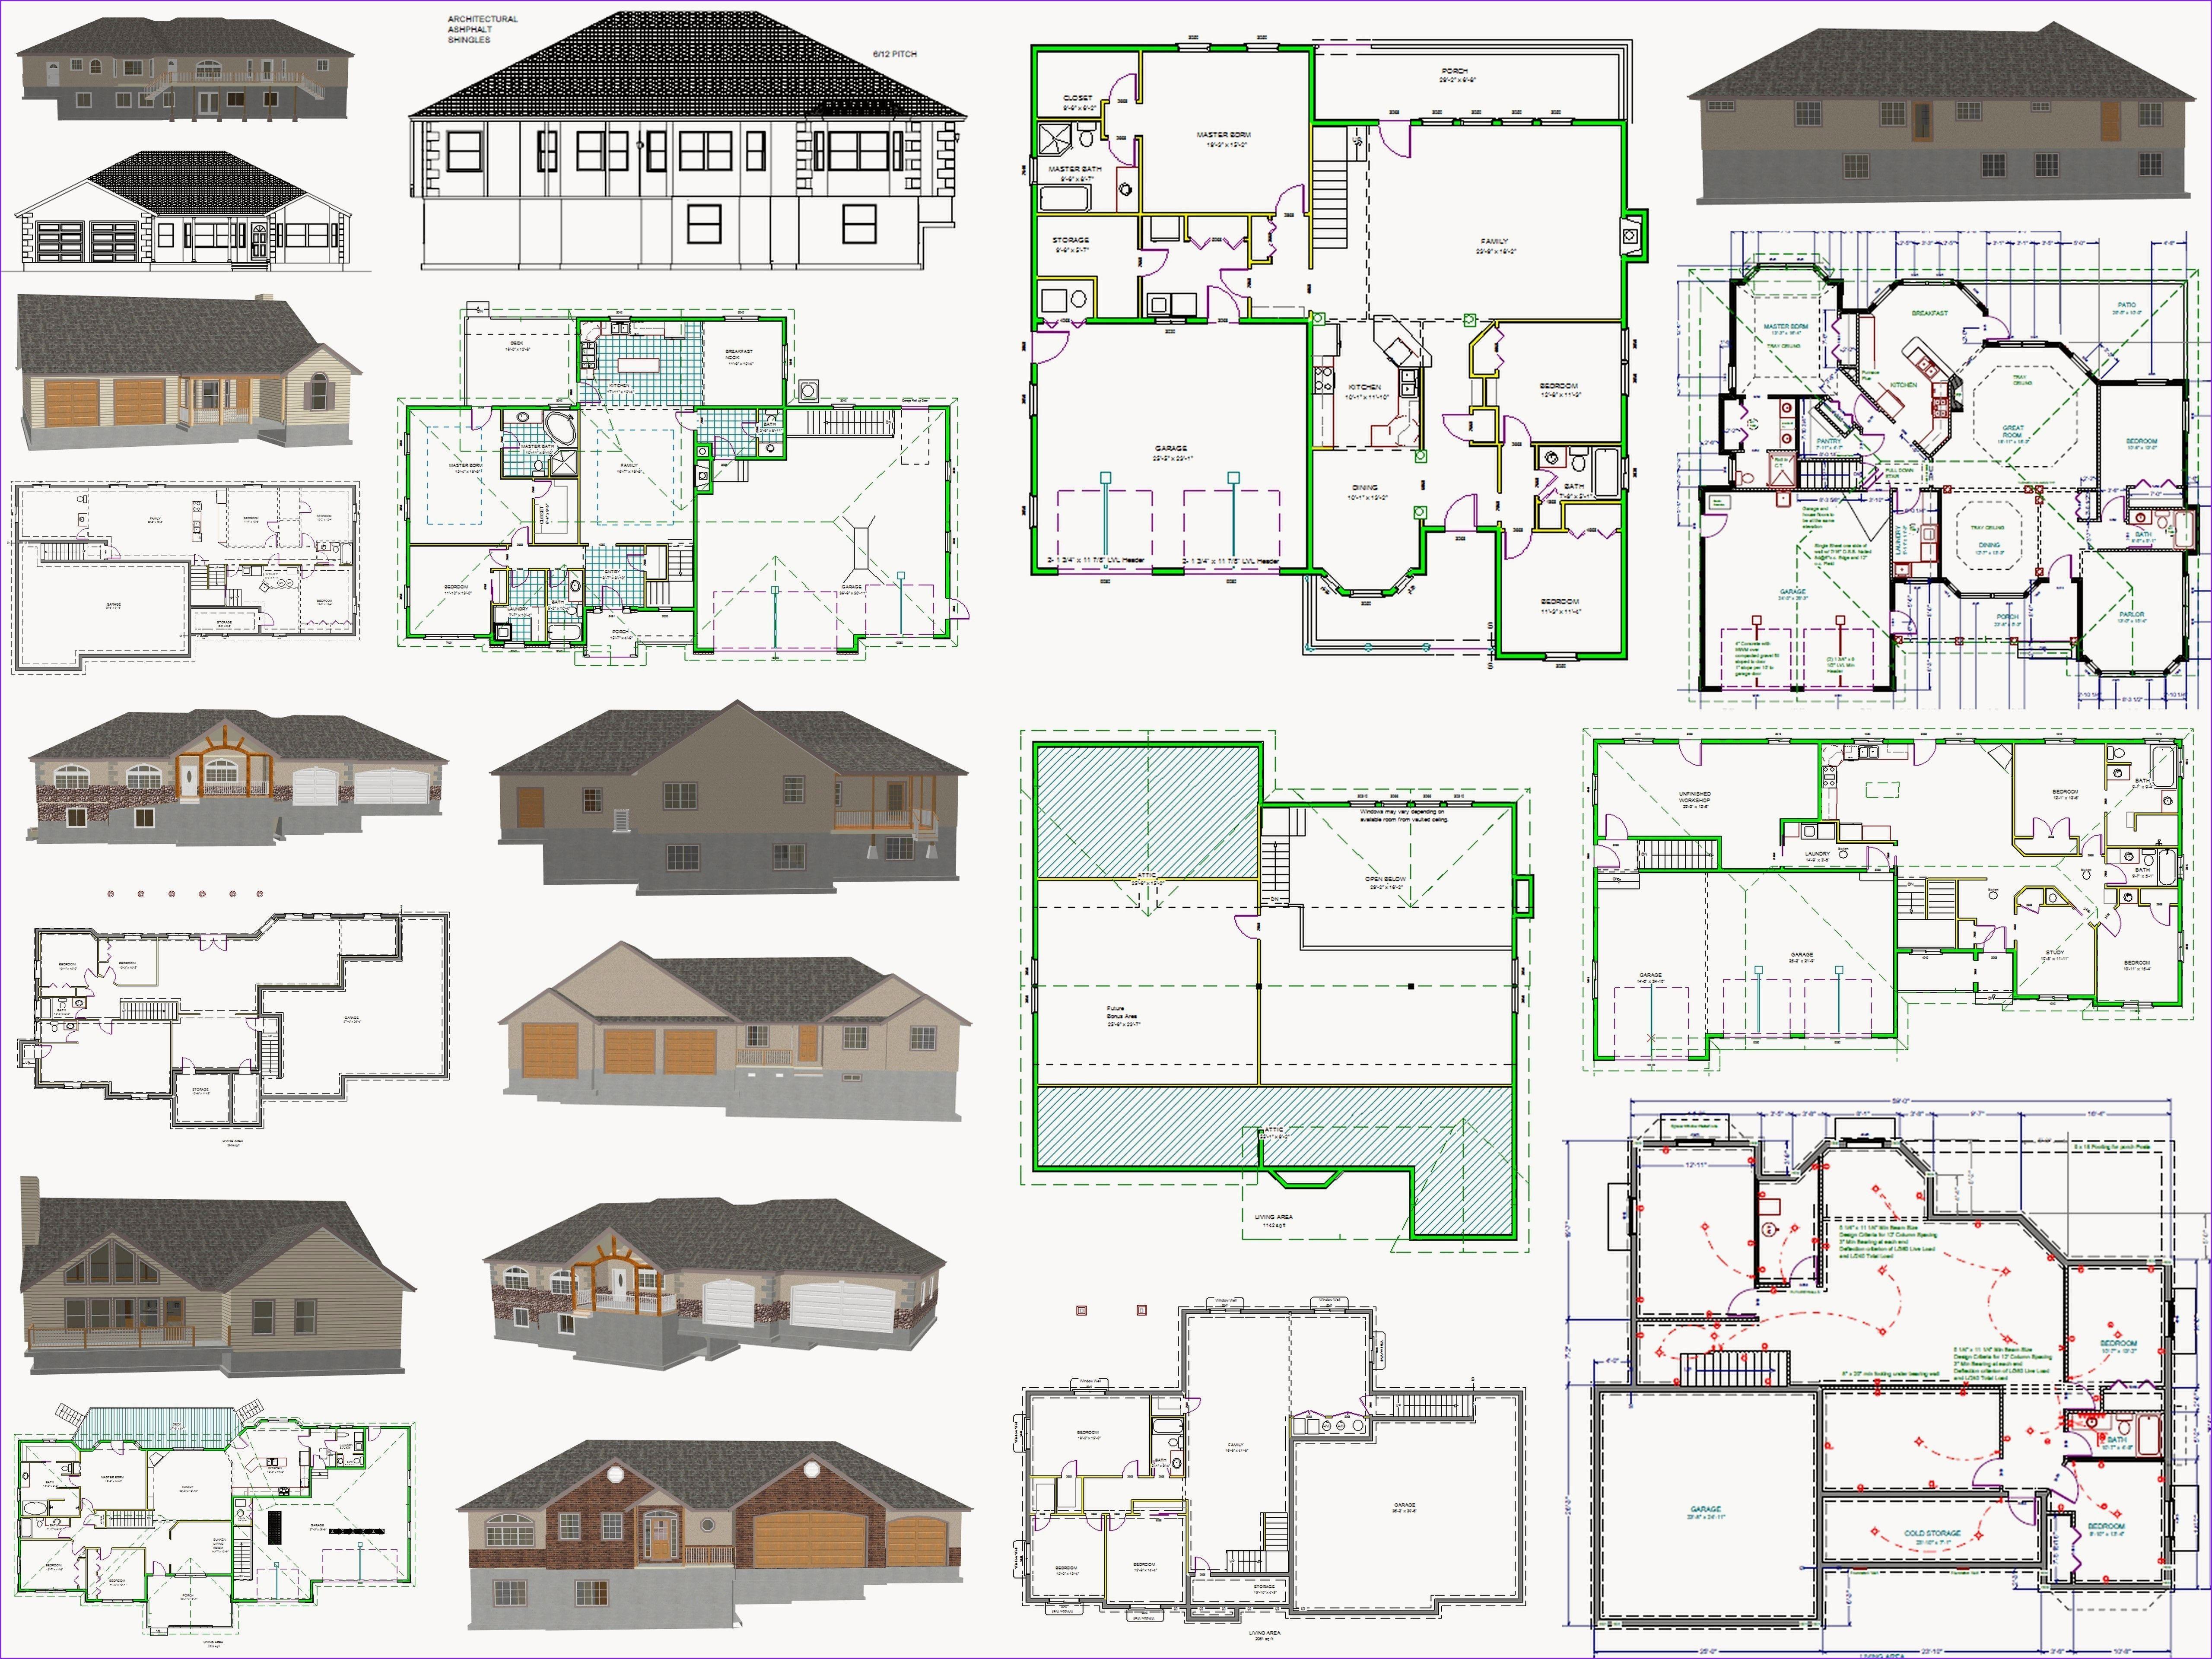 Awesome Walkout Basement House Plans House Layout Plans House Layouts Victorian House Plans